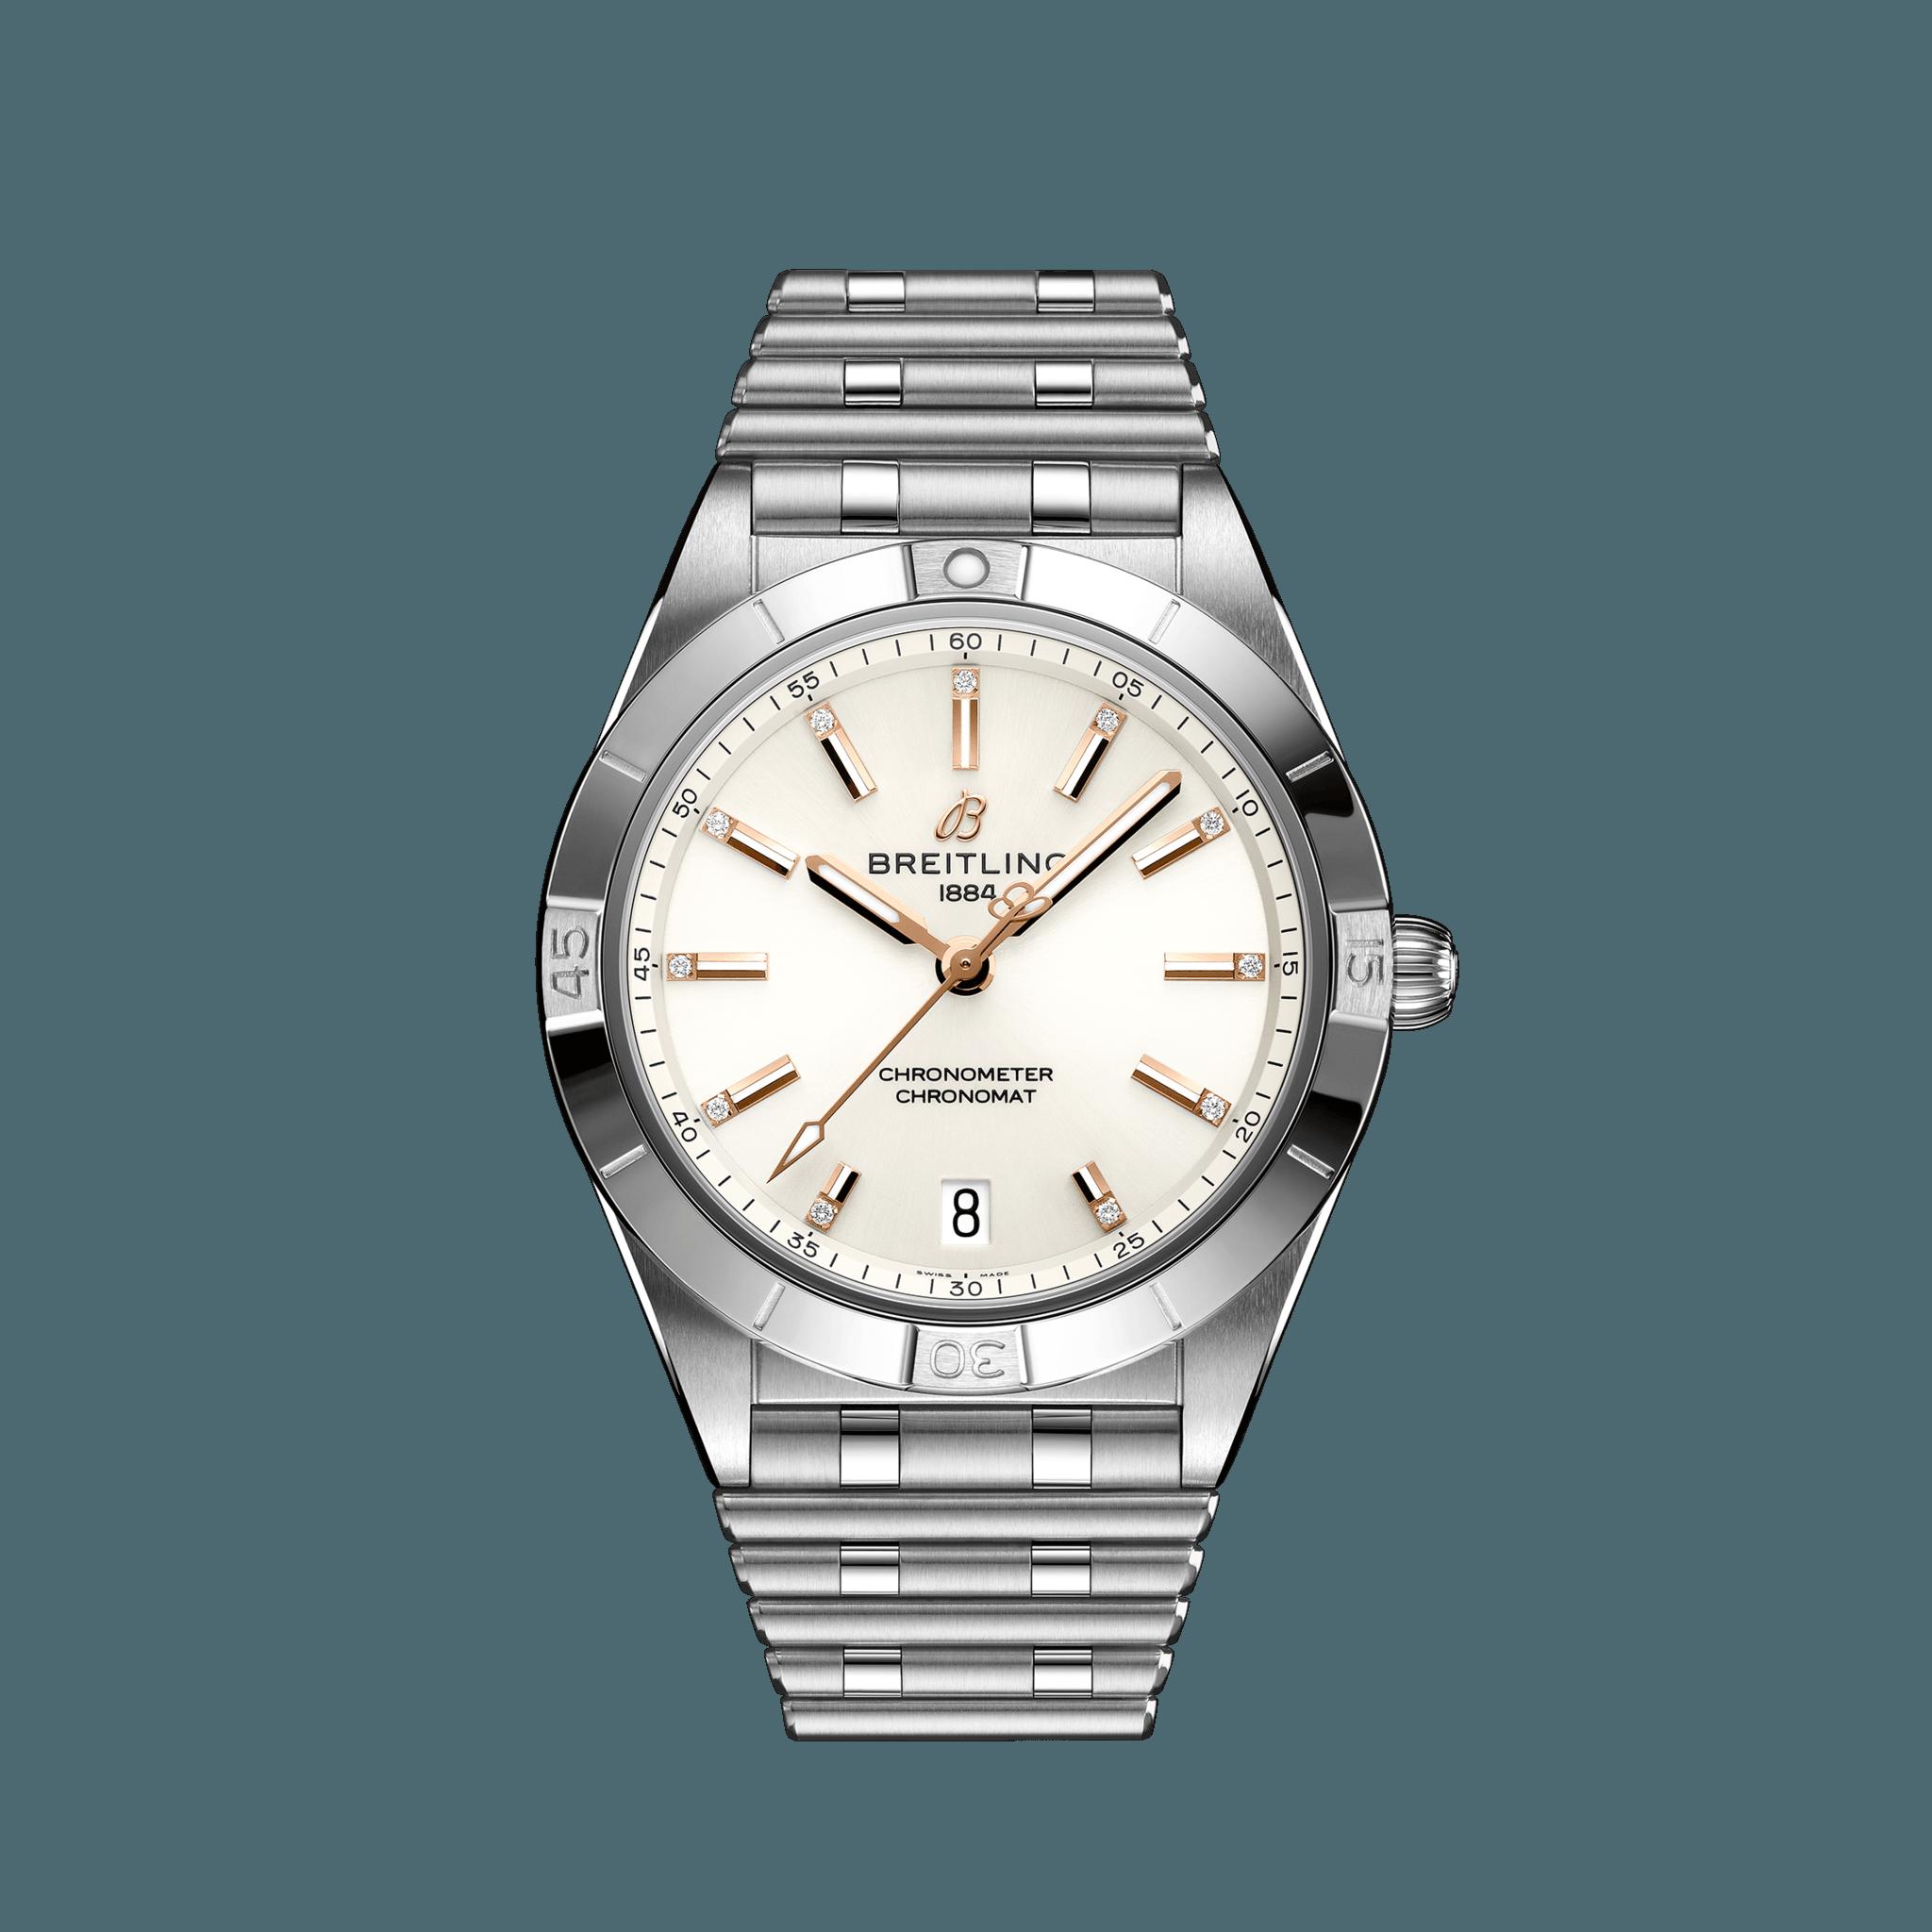 Breitling Chronomat Automatic 36 Brilliant-Ziffernblatt